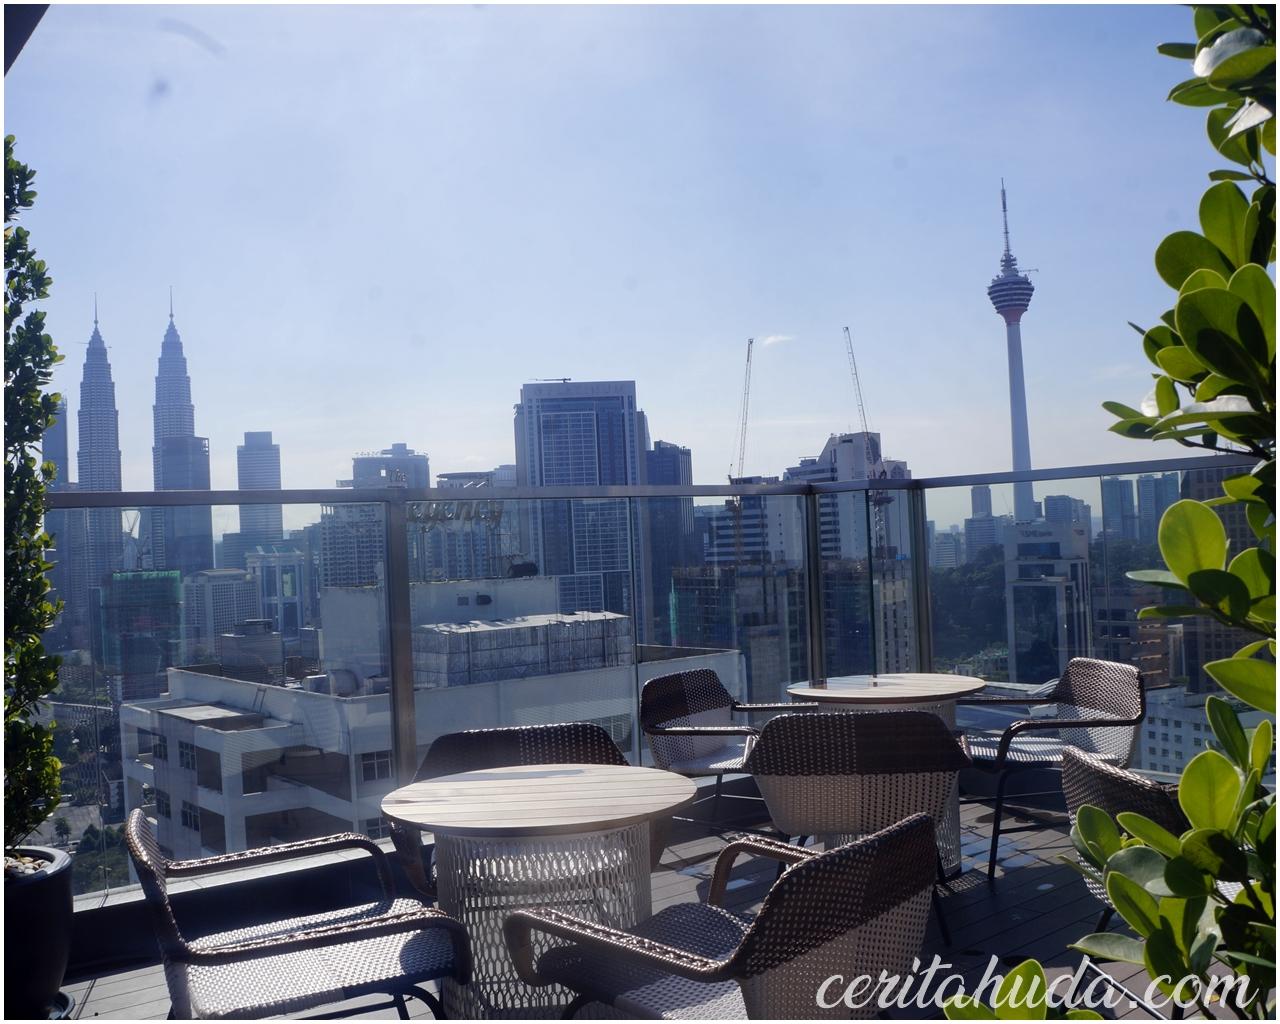 Staycation Pertama 2019 Di Hilton Garden Inn Kl Cerita Huda By Huda Halid